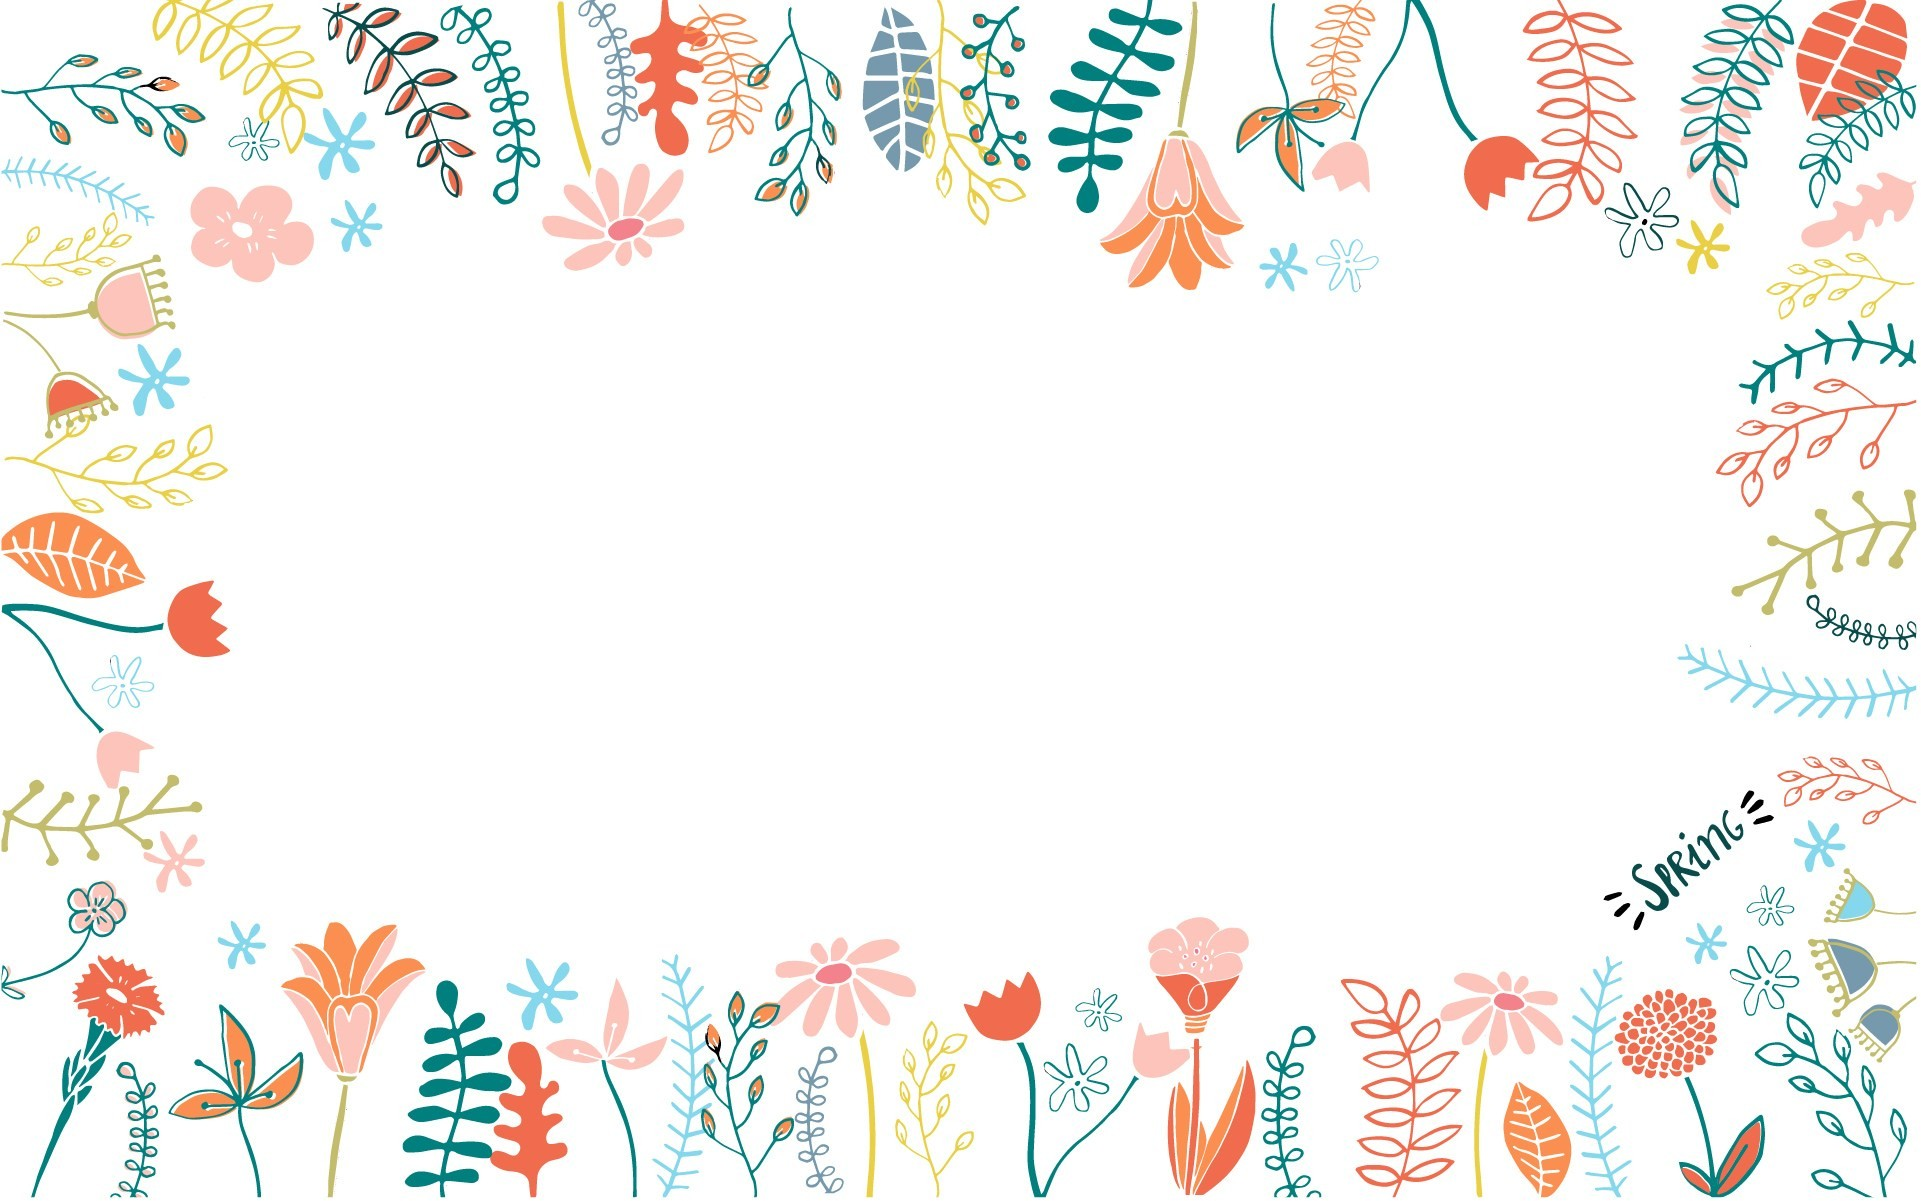 Most Inspiring Wallpaper Name Monika - 284320-download-free-floral-wallpaper-1921x1201  Pictures_731326.jpg